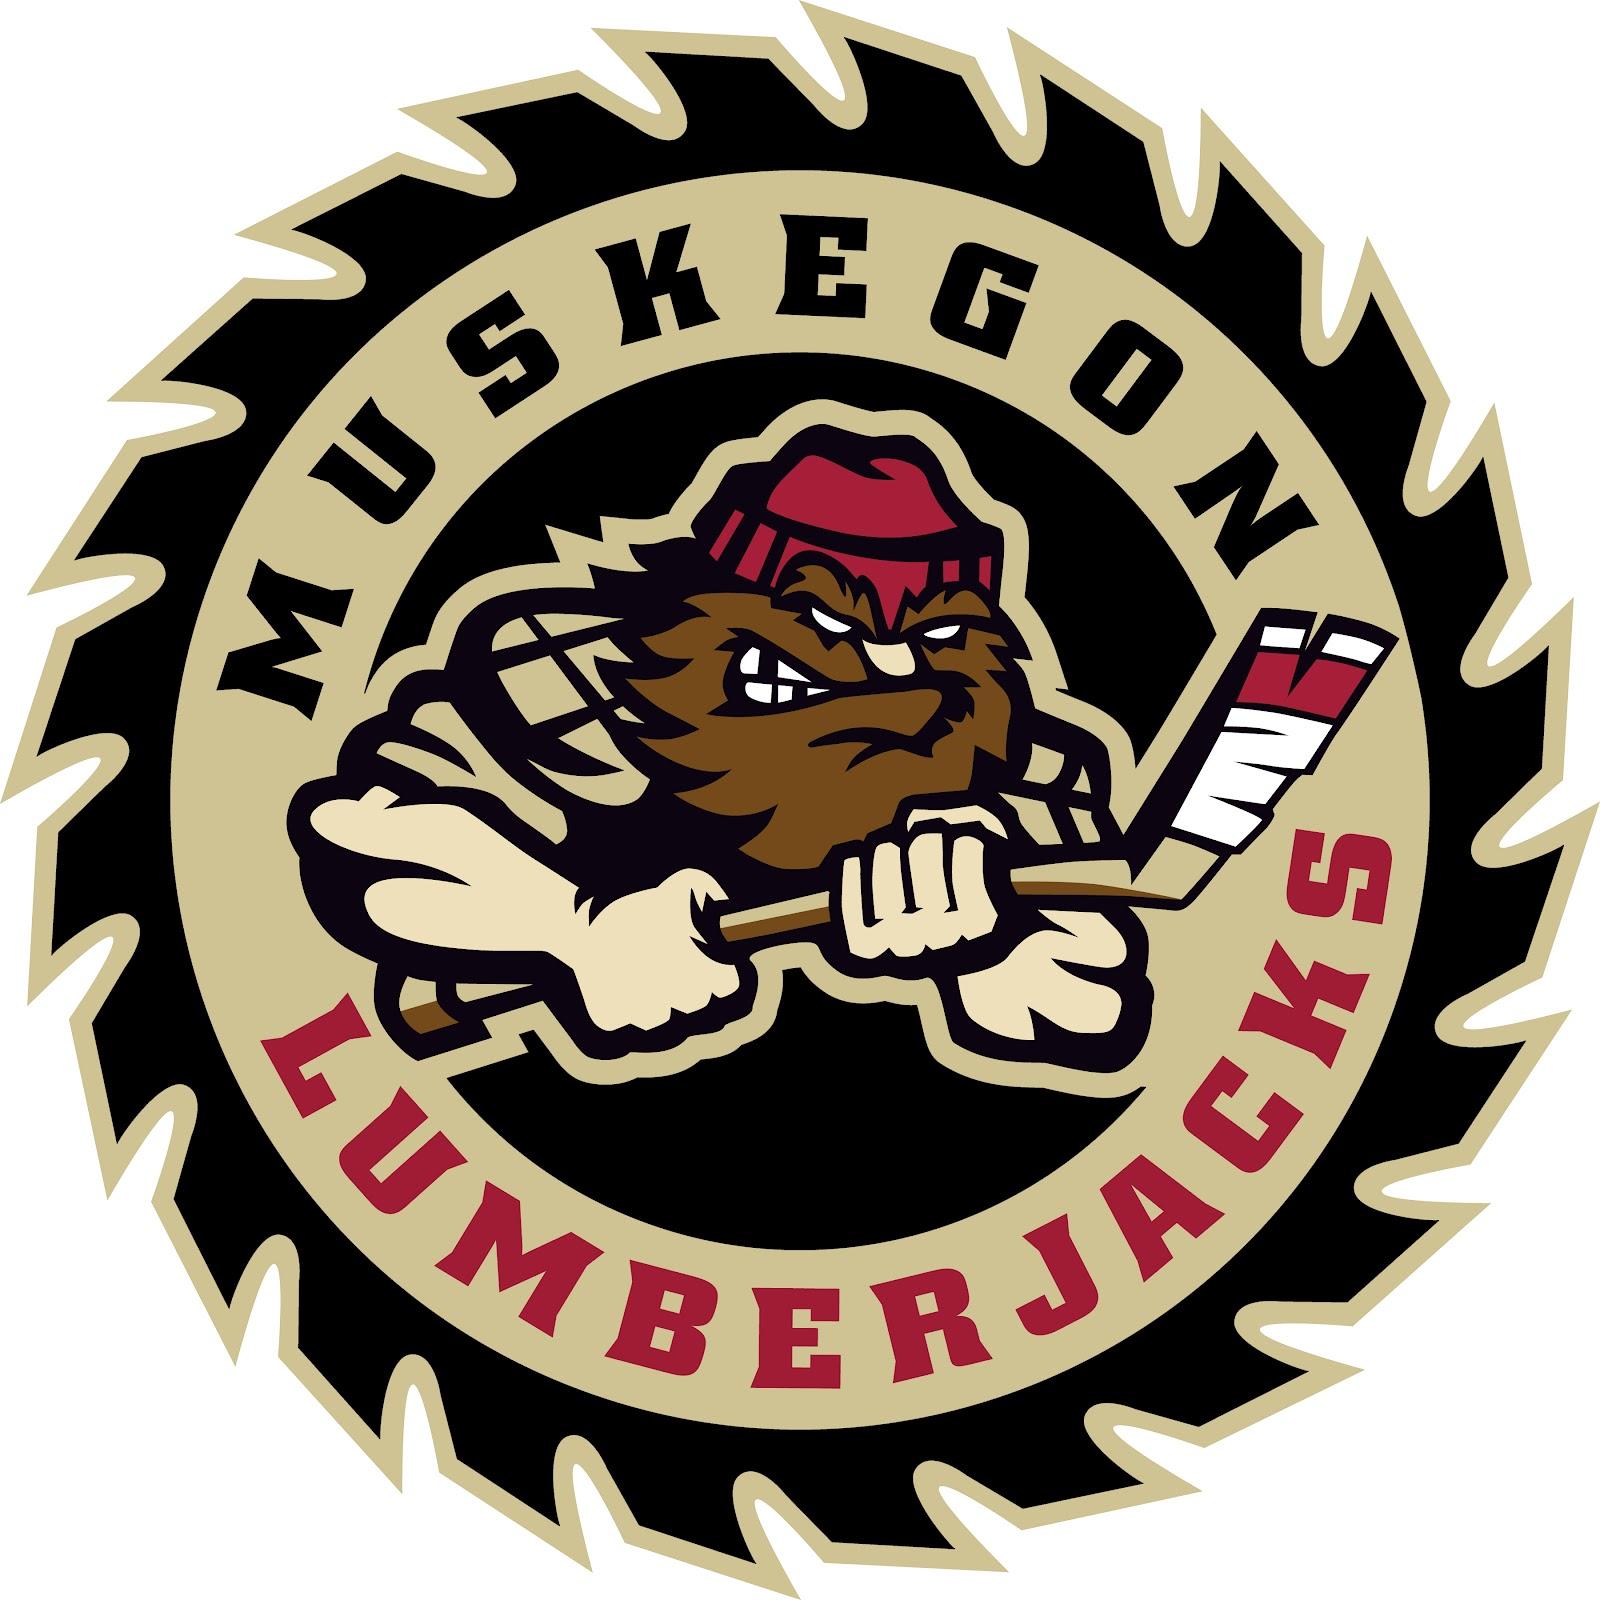 Michigan junior hockey lumberjacks unveil new team logo lumberjacks unveil new team logo buycottarizona Images